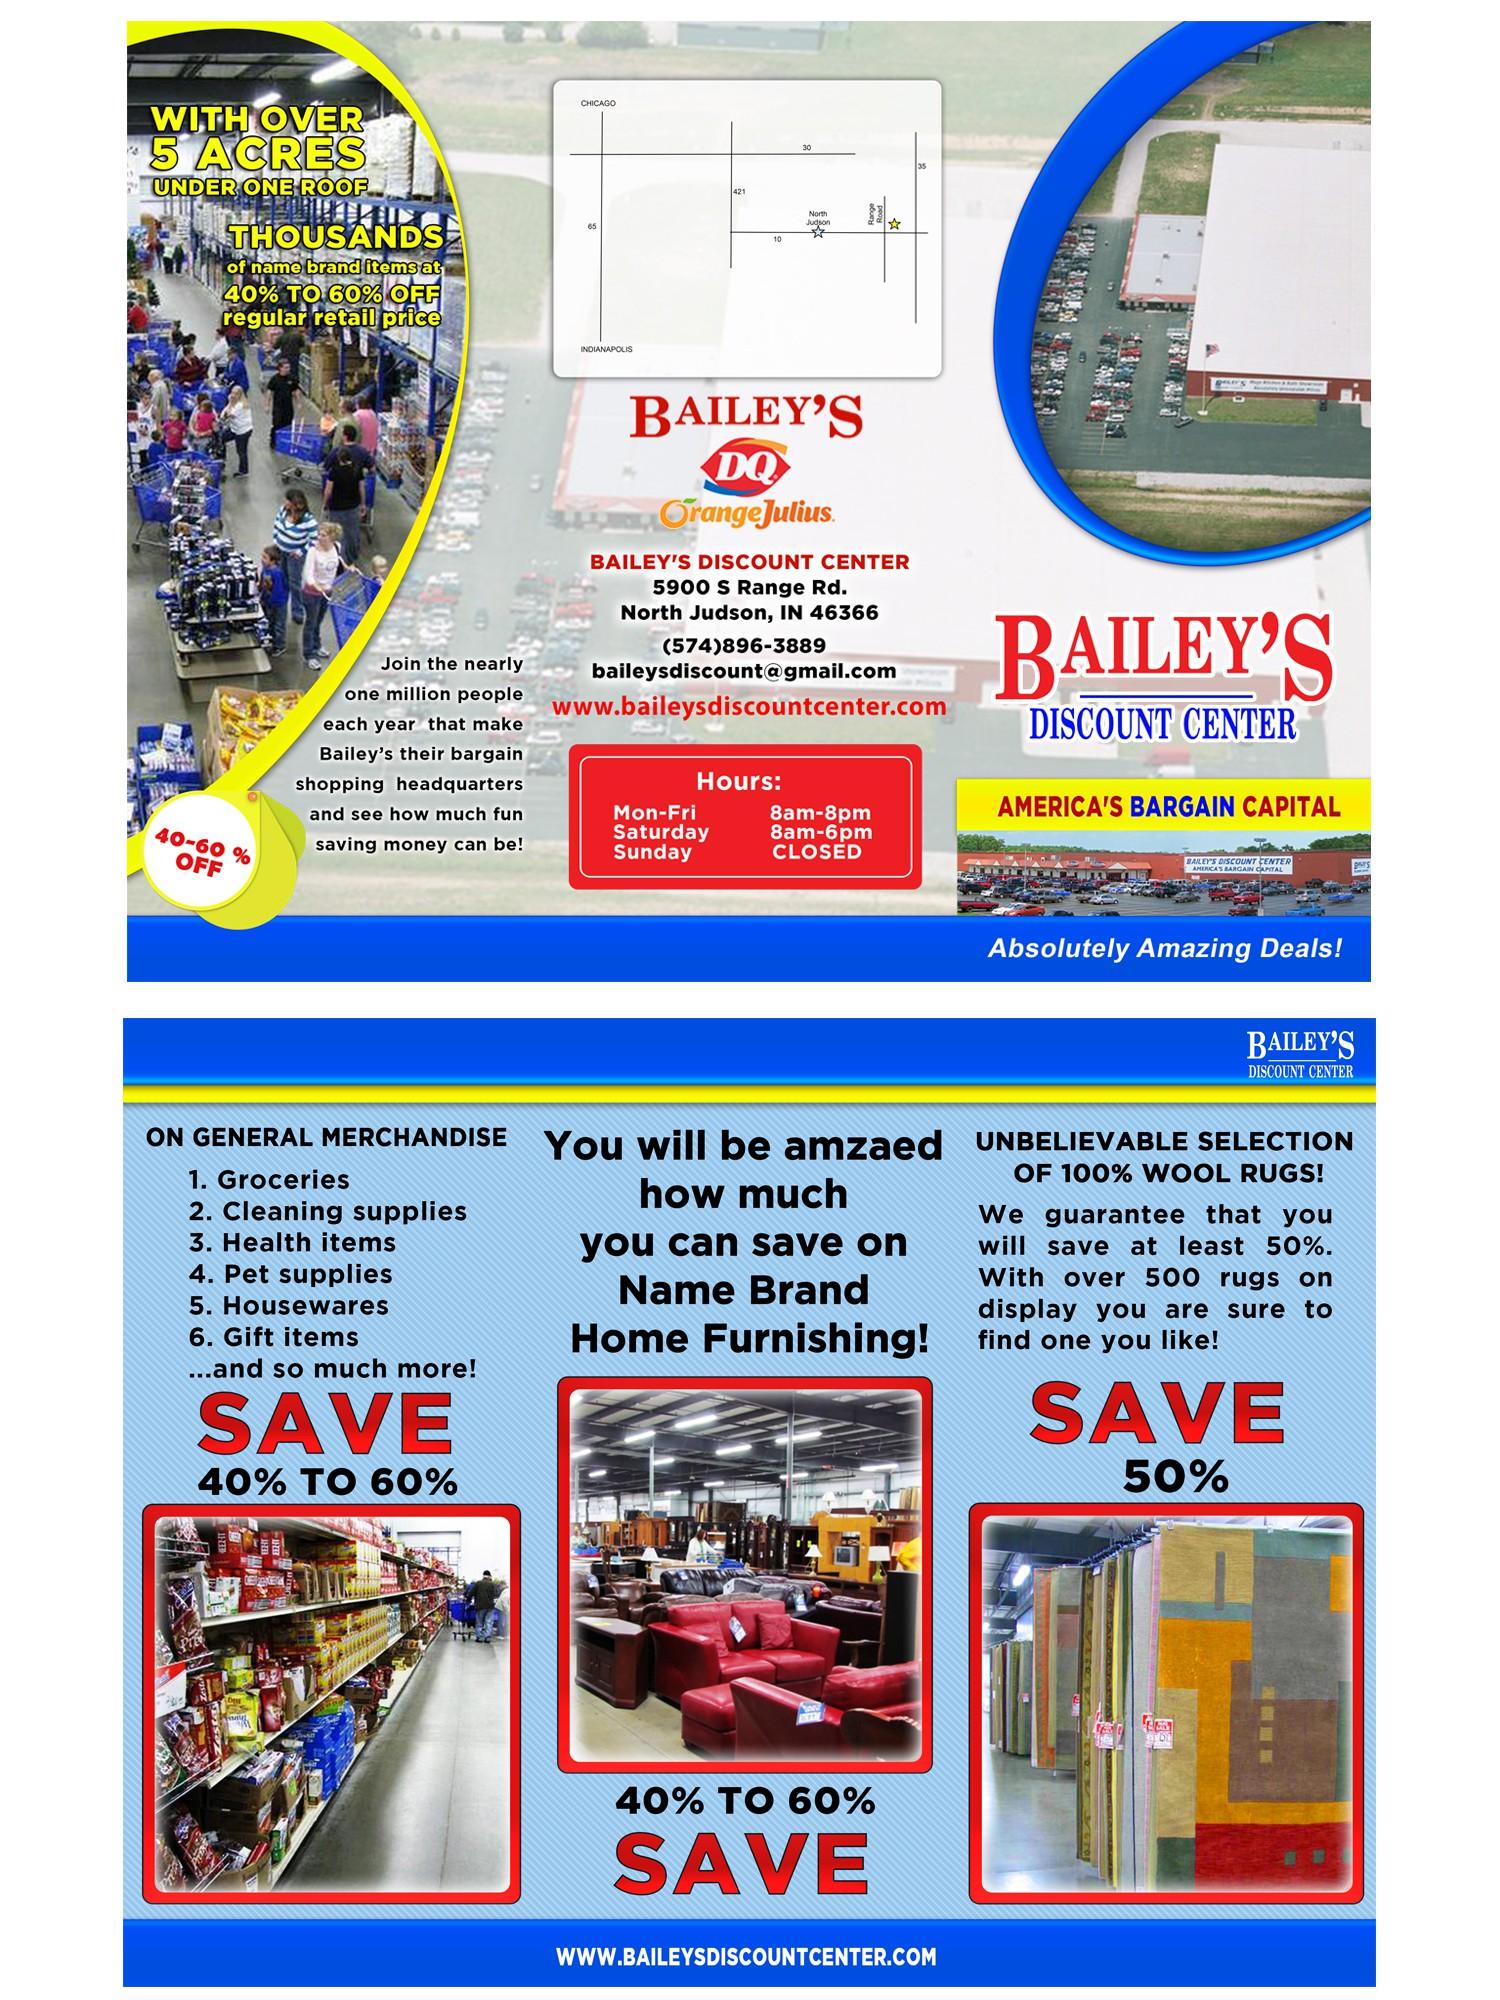 Create the next brochure design for Bailey's Discount Center